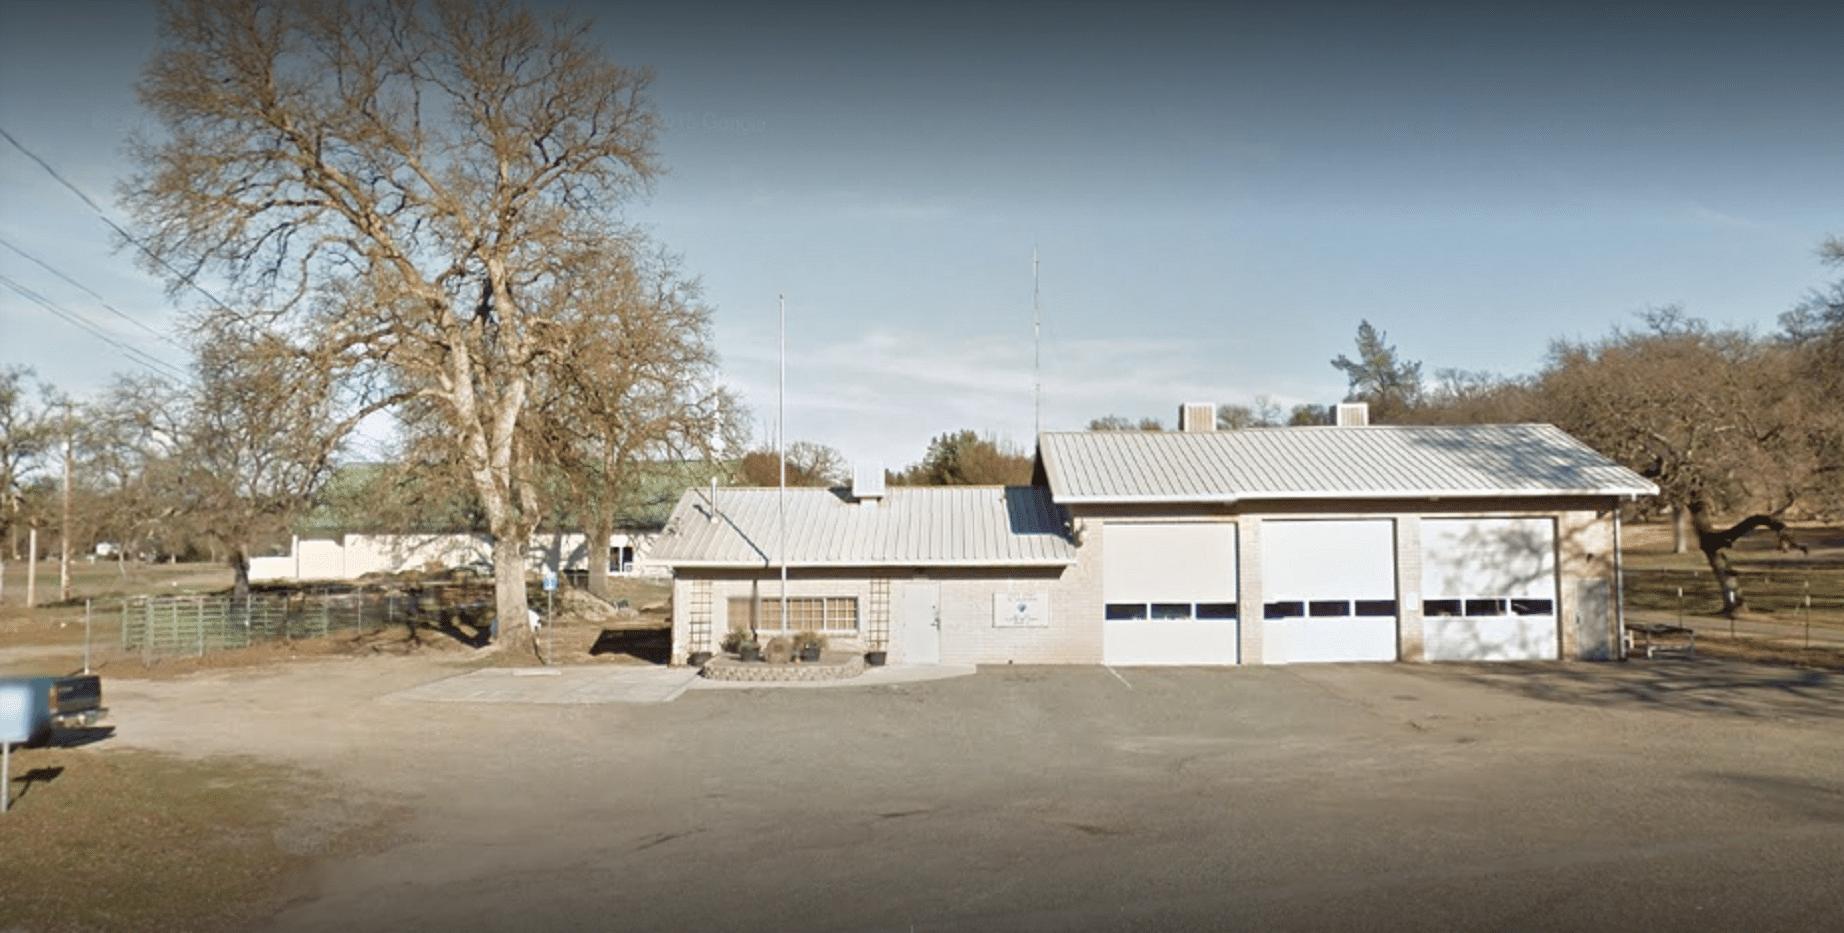 Dry Creek Station Restaurant